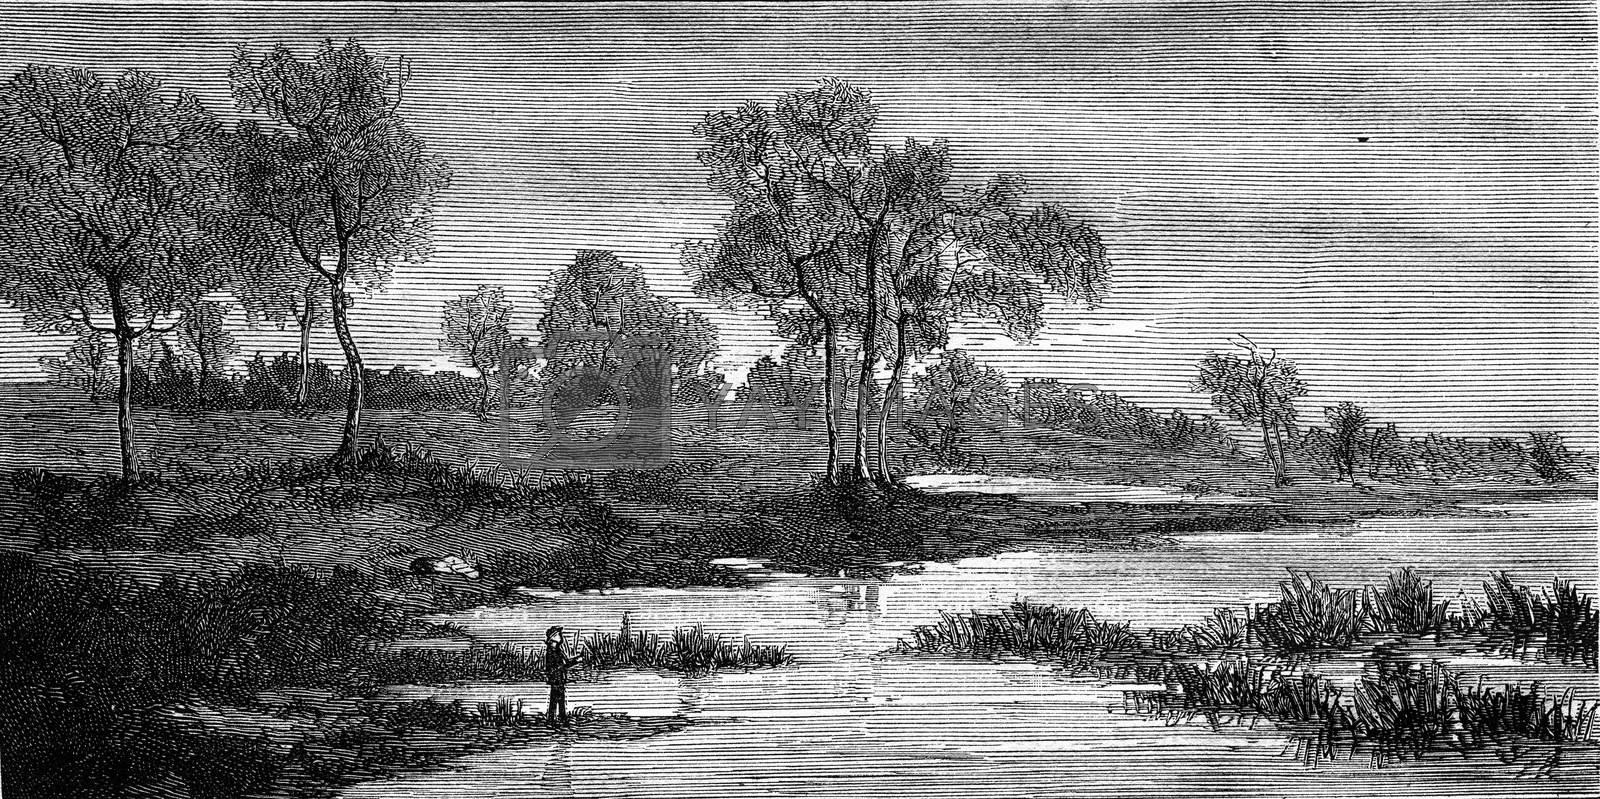 Landscapes by Fritz Van de Kerchove, vintage engraved illustration. Magasin Pittoresque 1876.